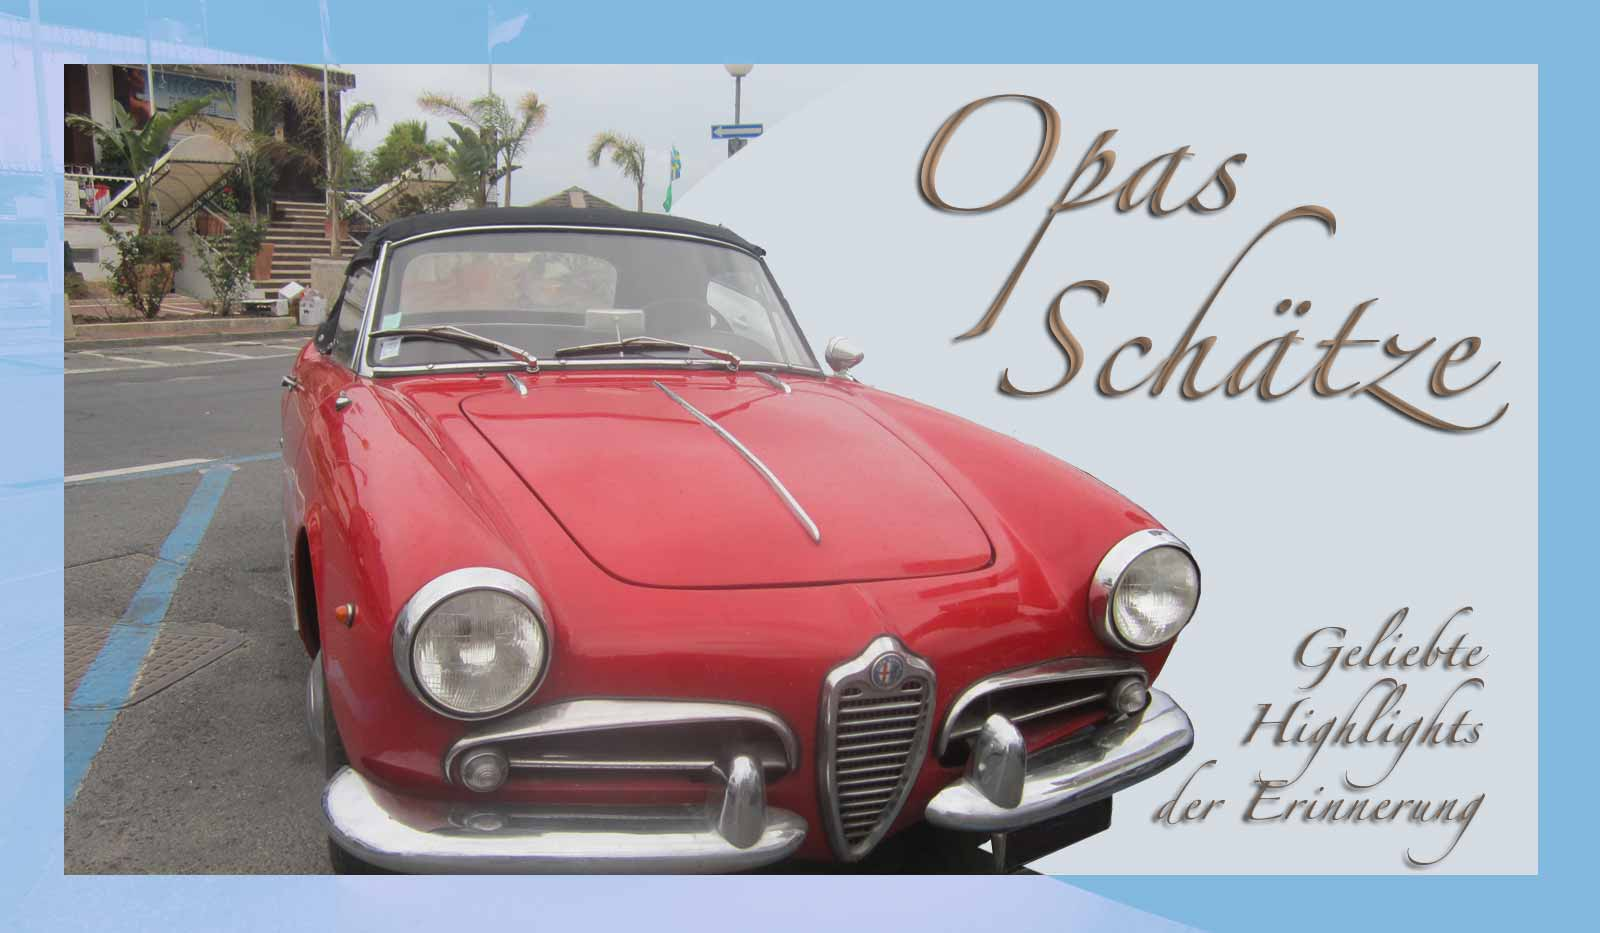 Opas Schätze - geliebte Highlights der Erinnerung